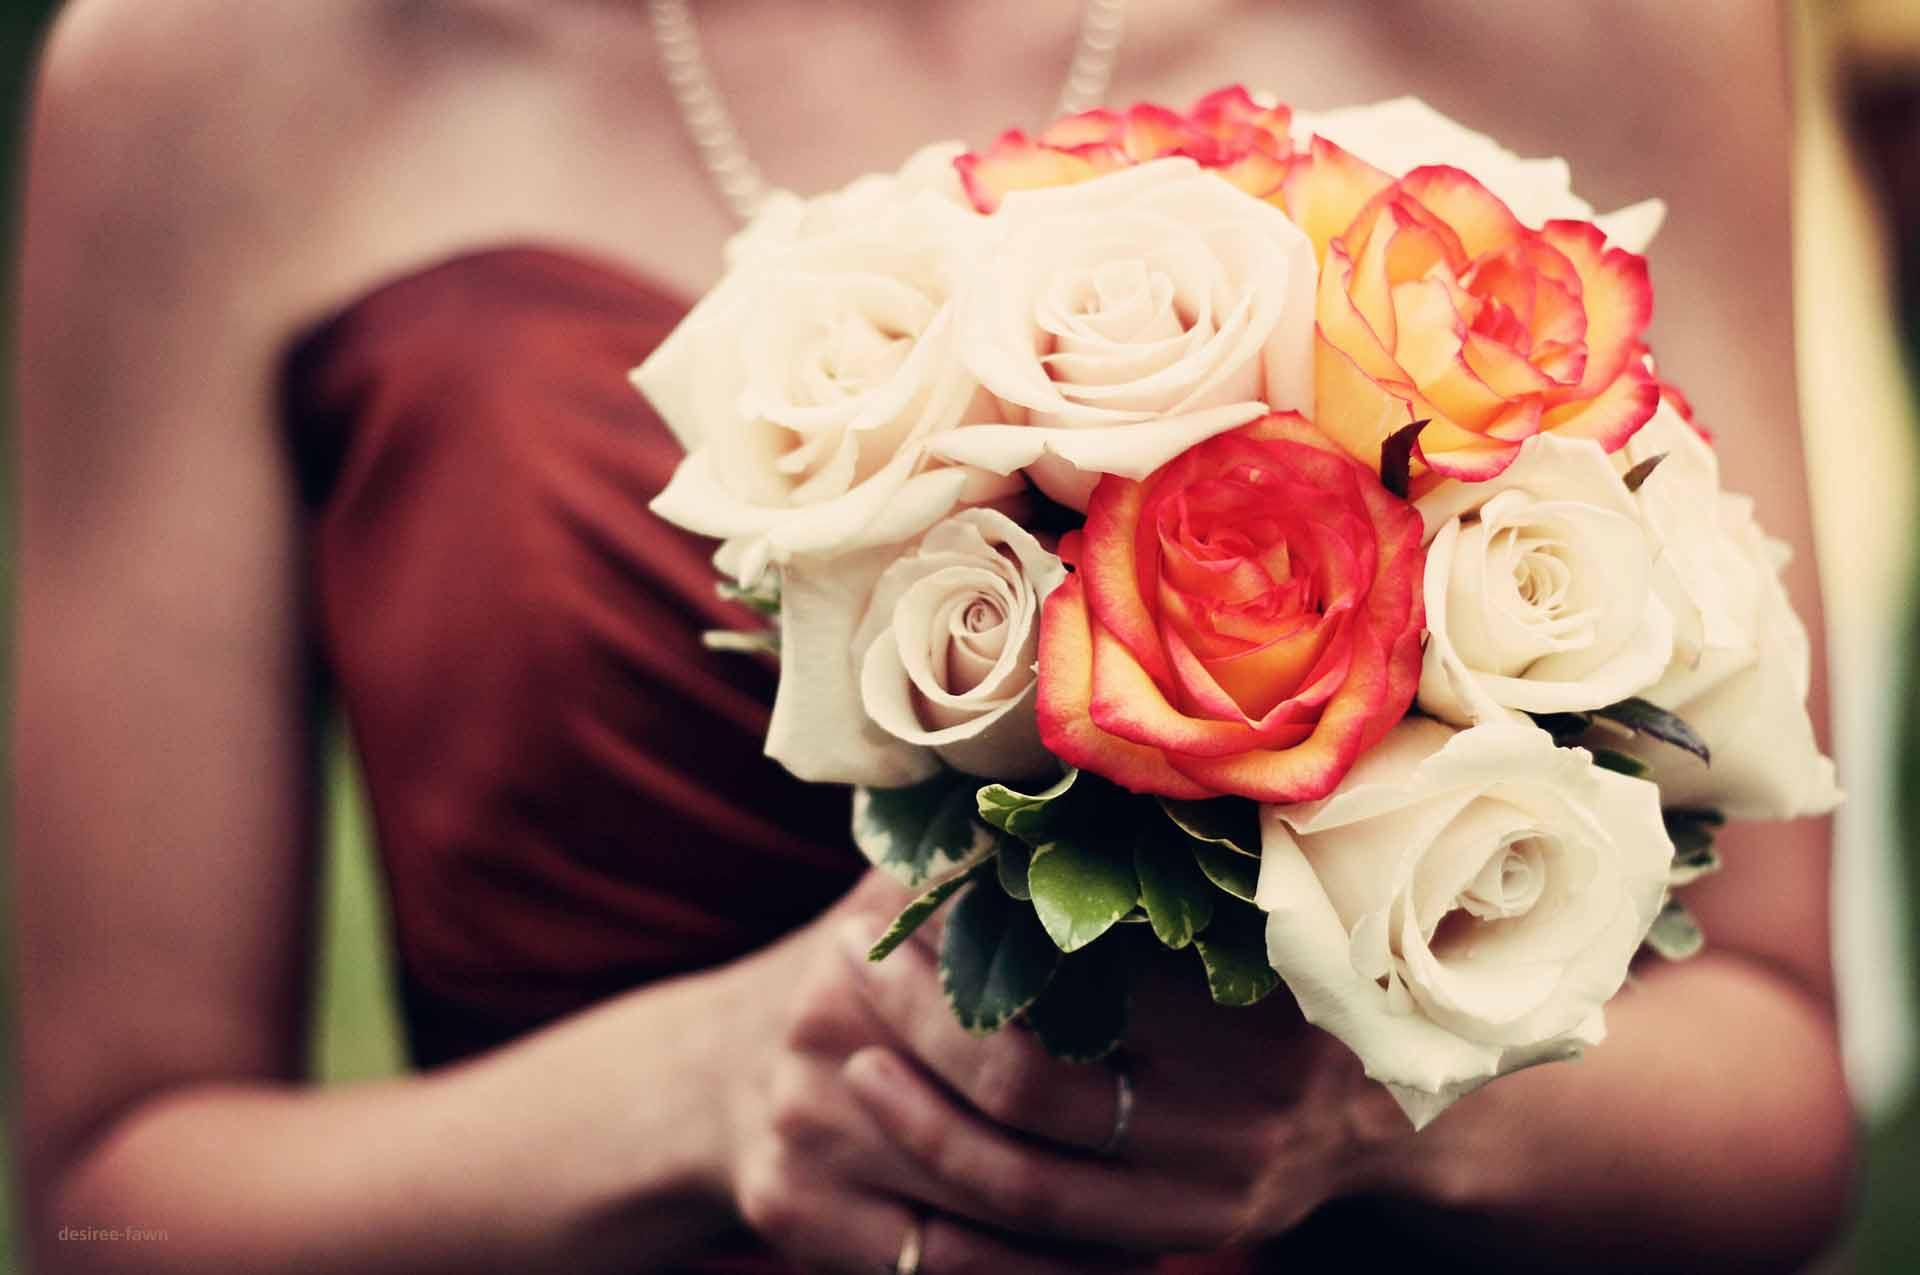 Feier Feiern Hochzeit Blumen Geschenk online Sass